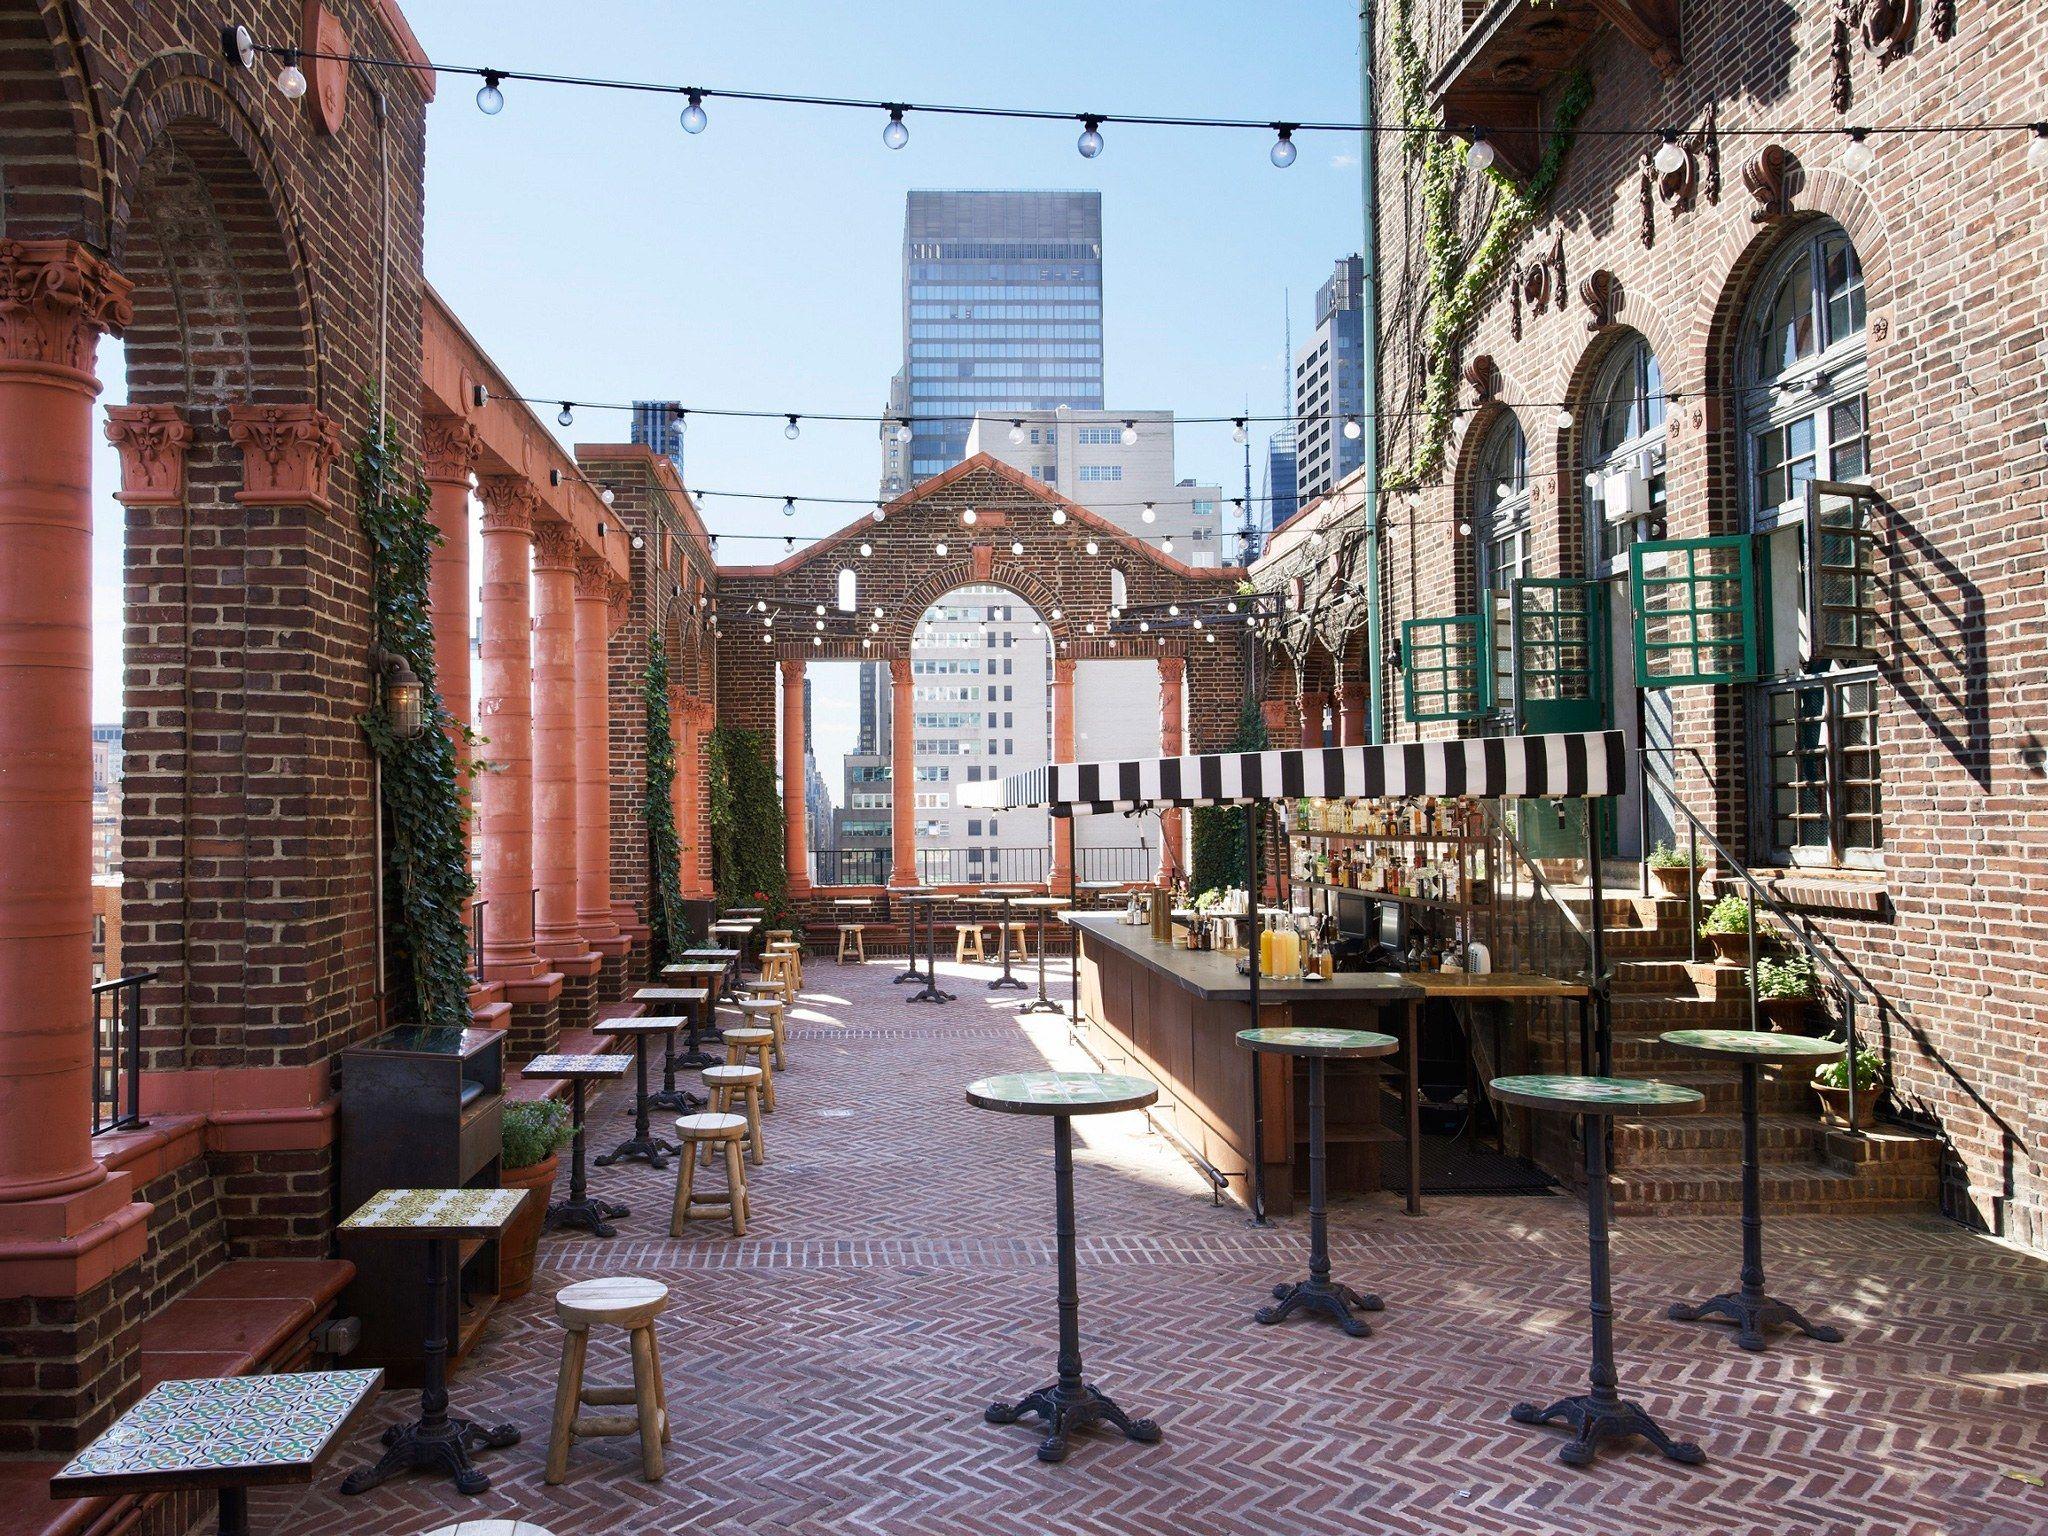 best 25 new york city ideas on pinterest new york travel new